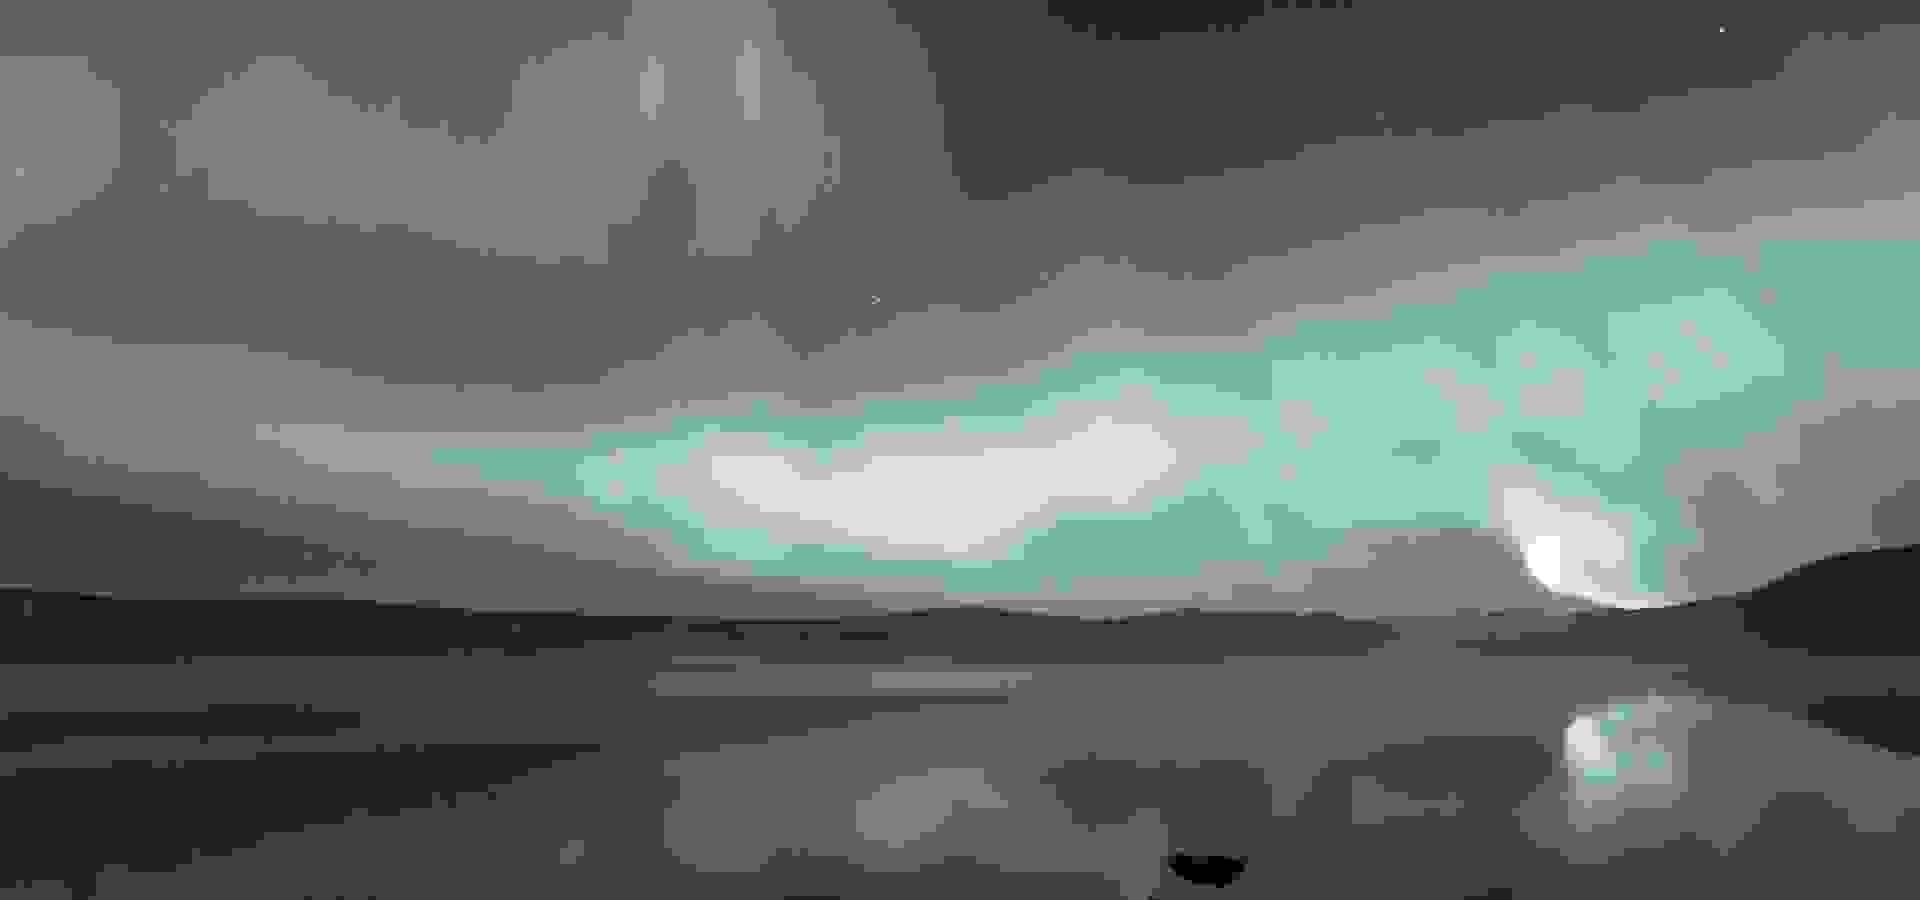 norrsken, northern lights, aurora borealis, 1920 x 900, mia stålnacke